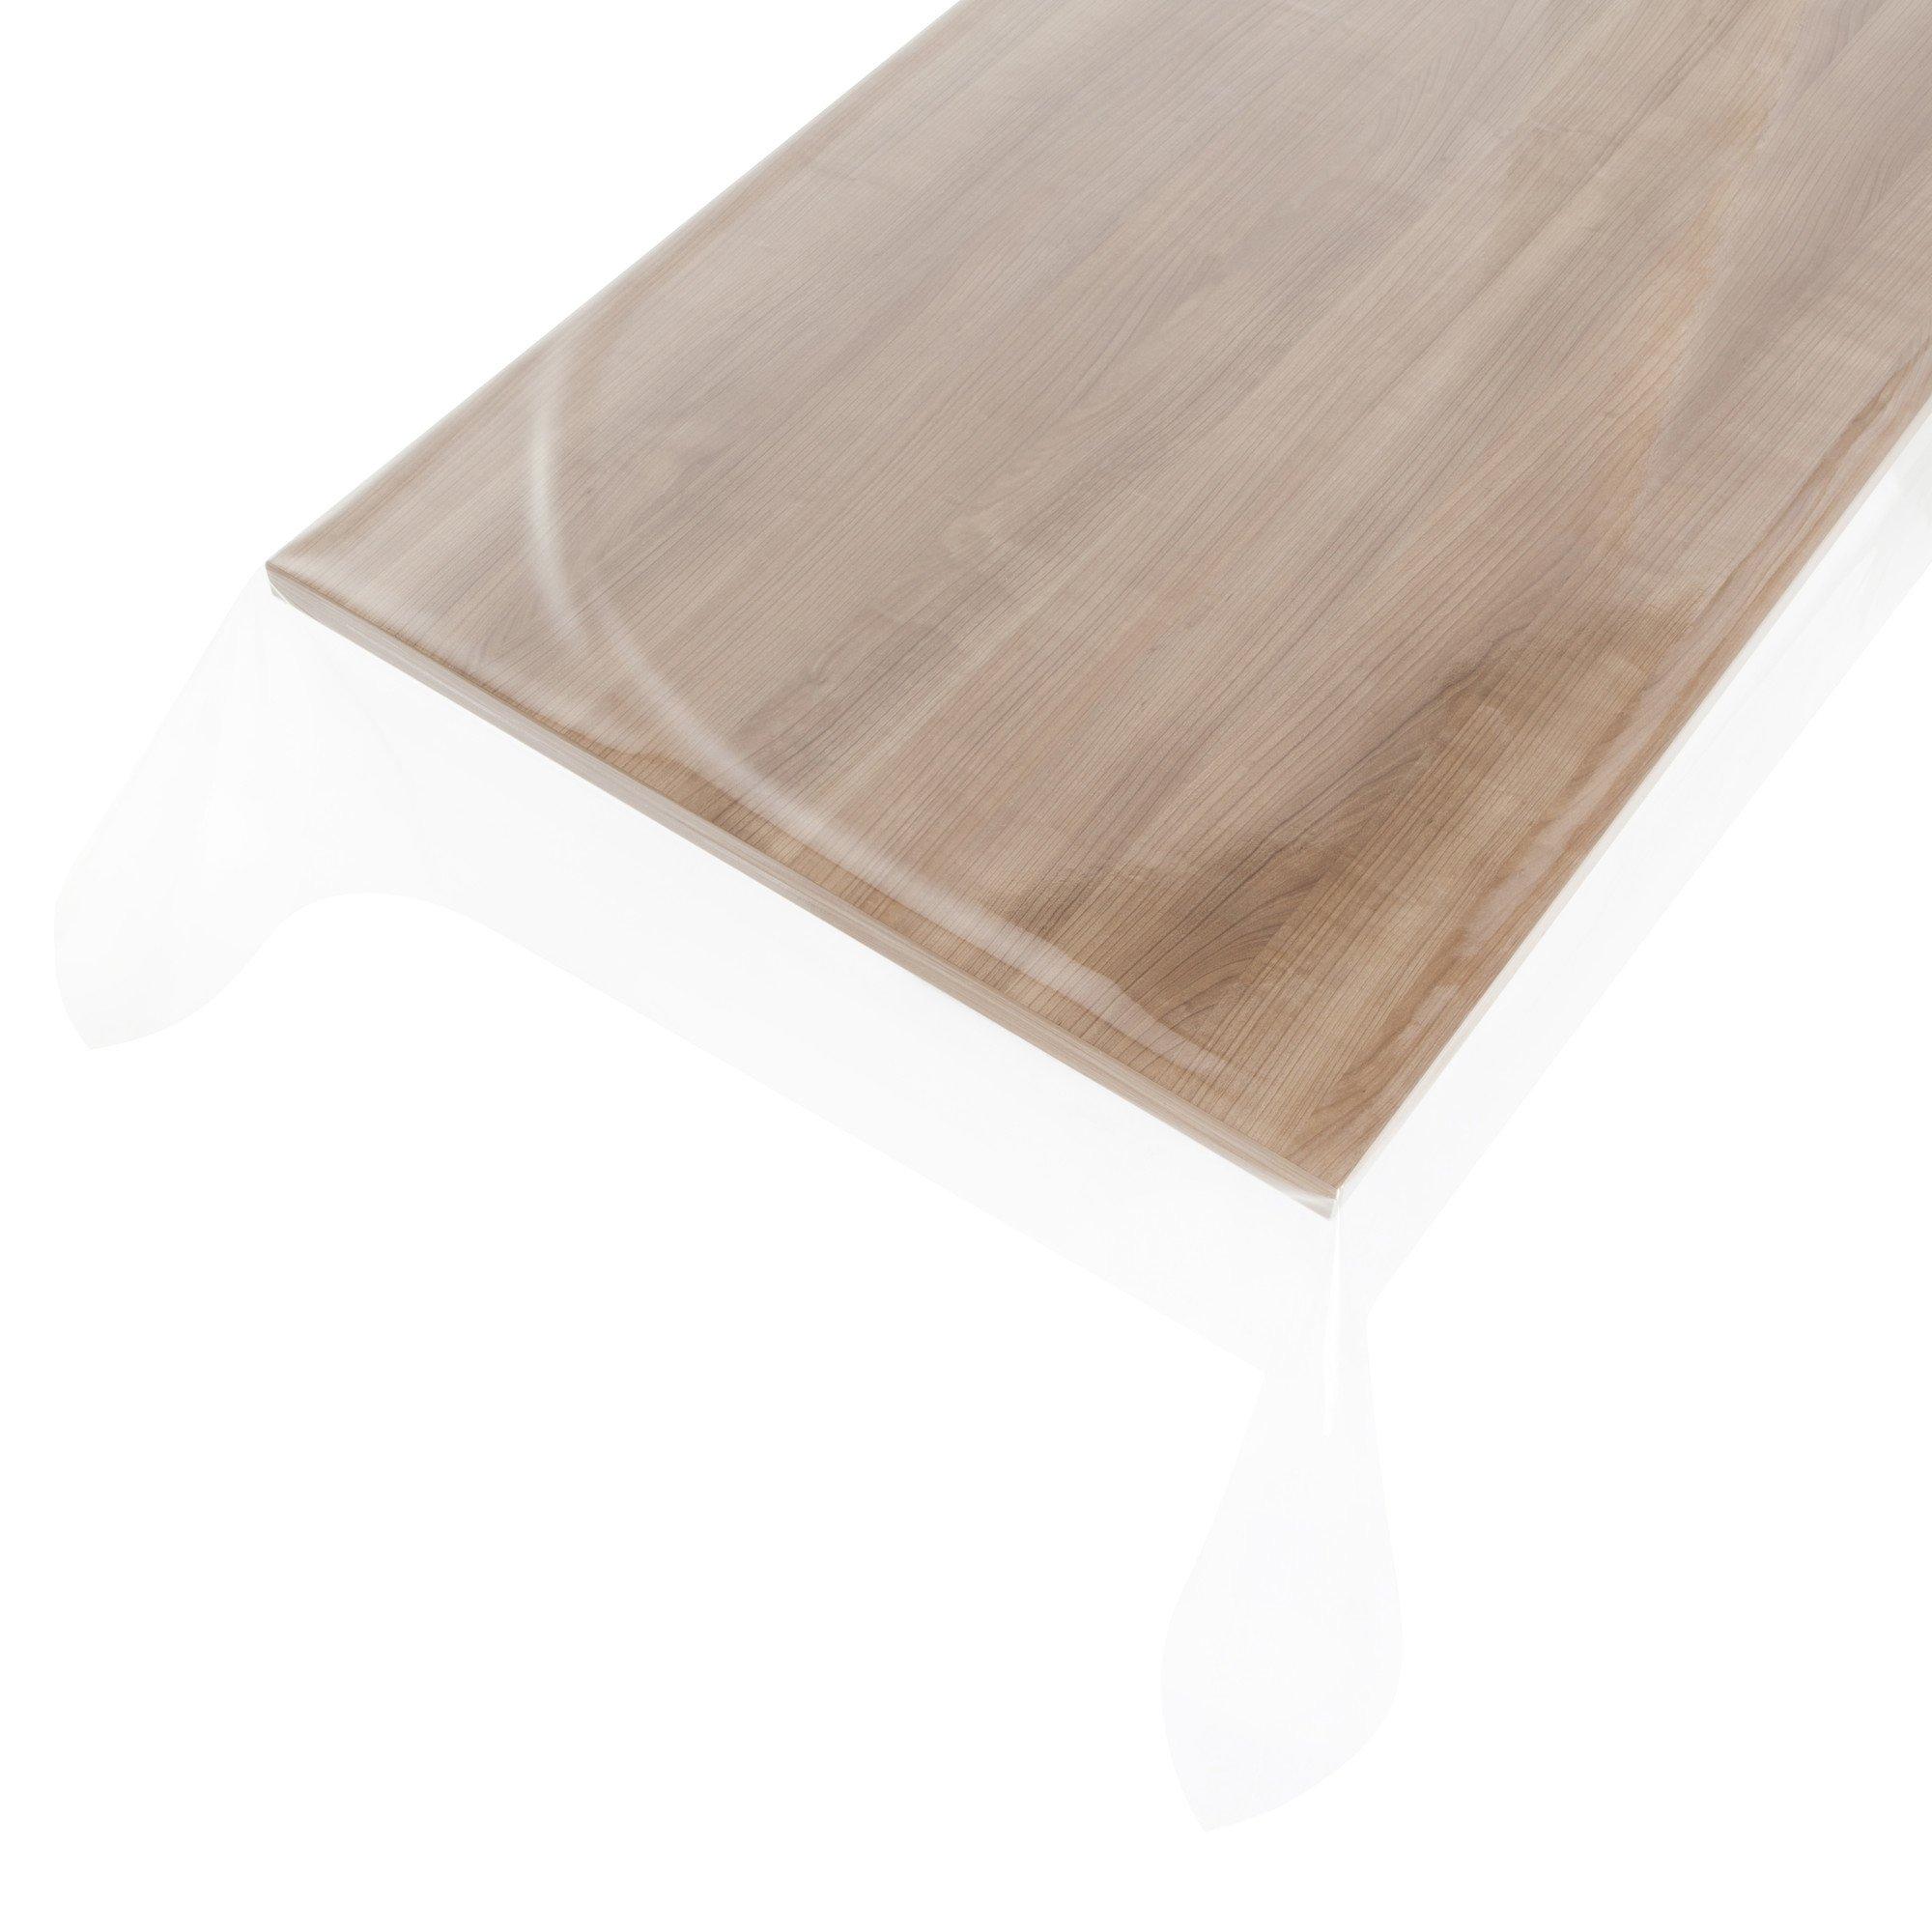 Doorzichtig tafelzeil Glashelder - 0,3mm